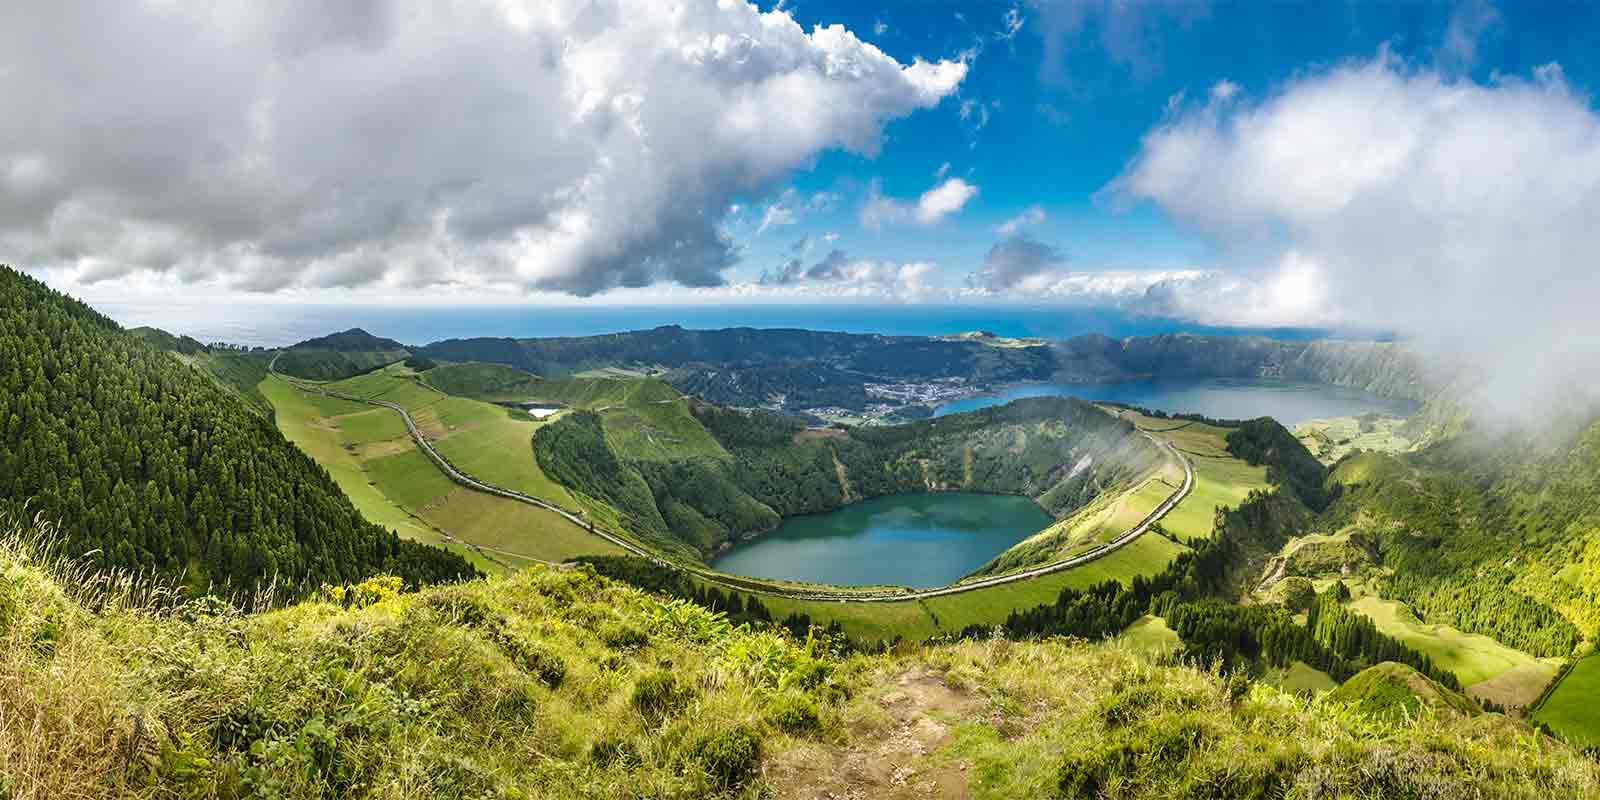 View to Sete Citades caldera in the Azores